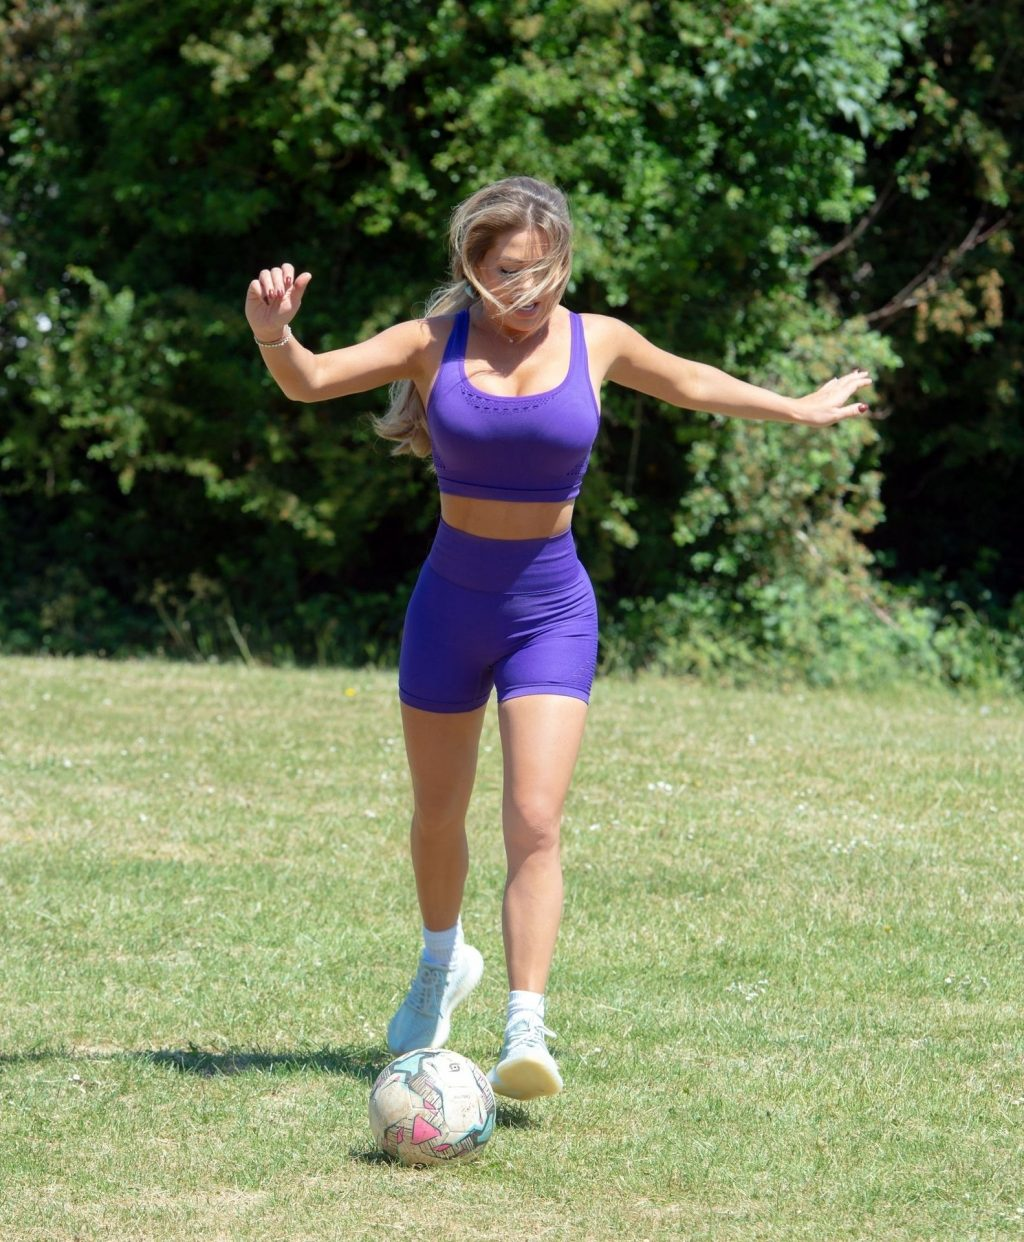 Bianca Gascoigne Shows Off Her Impressive Balls Skills in a Purple Two-piece (9 Photos)